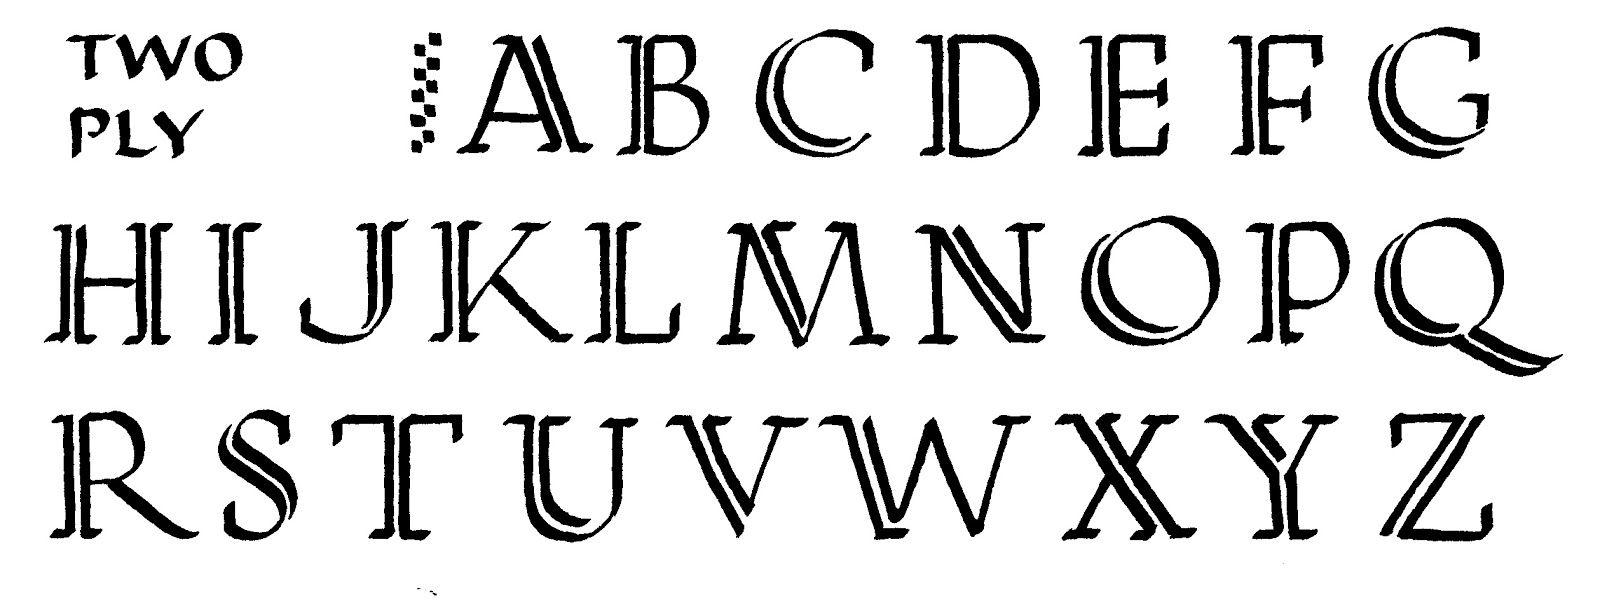 Margaret Shepherd Calligraphy Blog January 2013